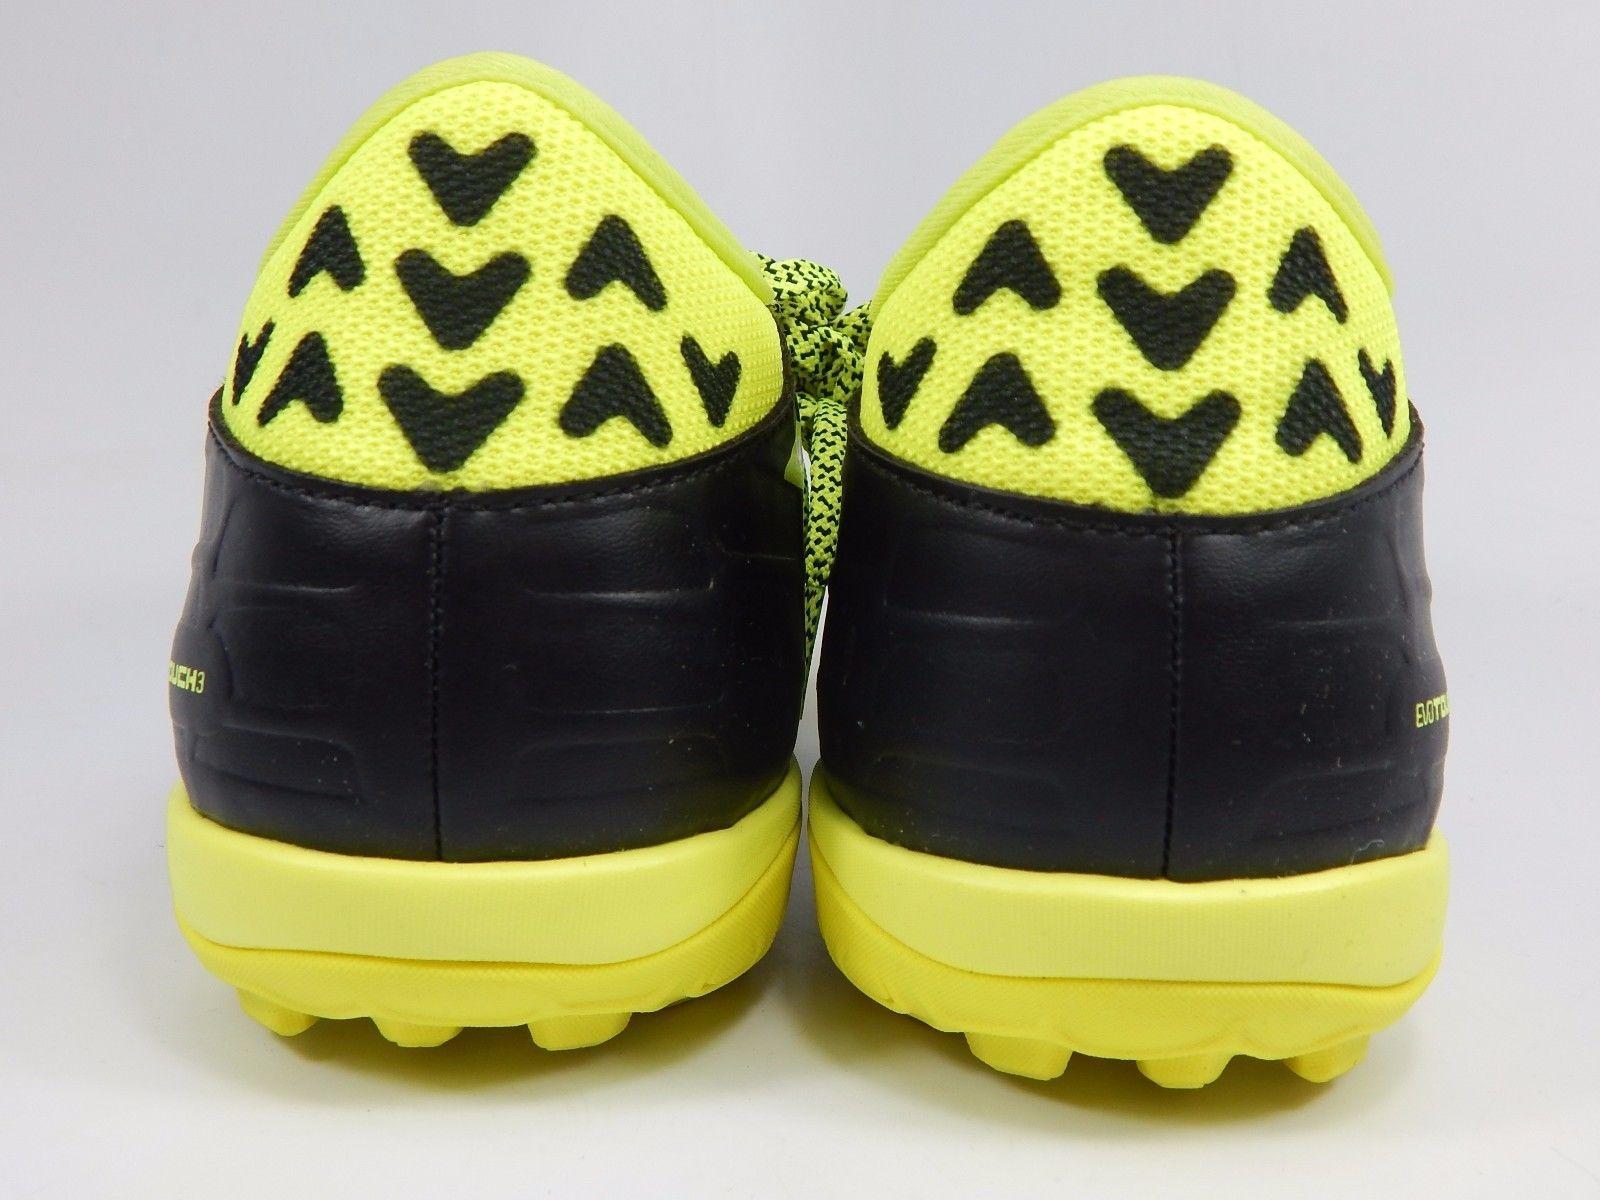 Puma evoTouch 3 TT Men's Soccer Cleats Size US 7.5 M (D) EU 40 Black Yellow